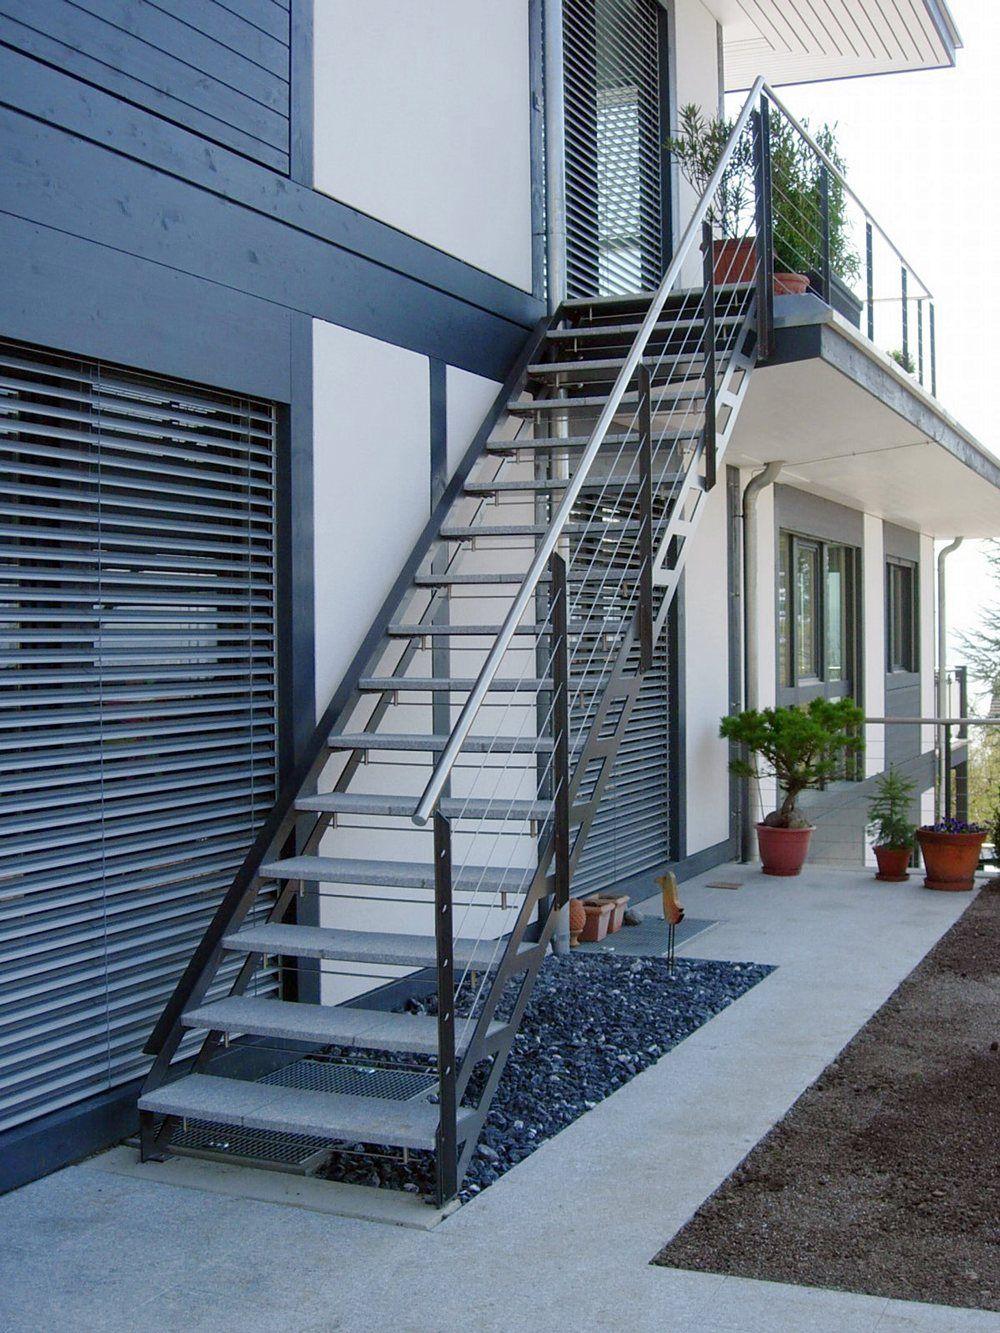 Keller Mit Aussentreppe Google Zoeken … Aussentreppe | Outside Stairs For House